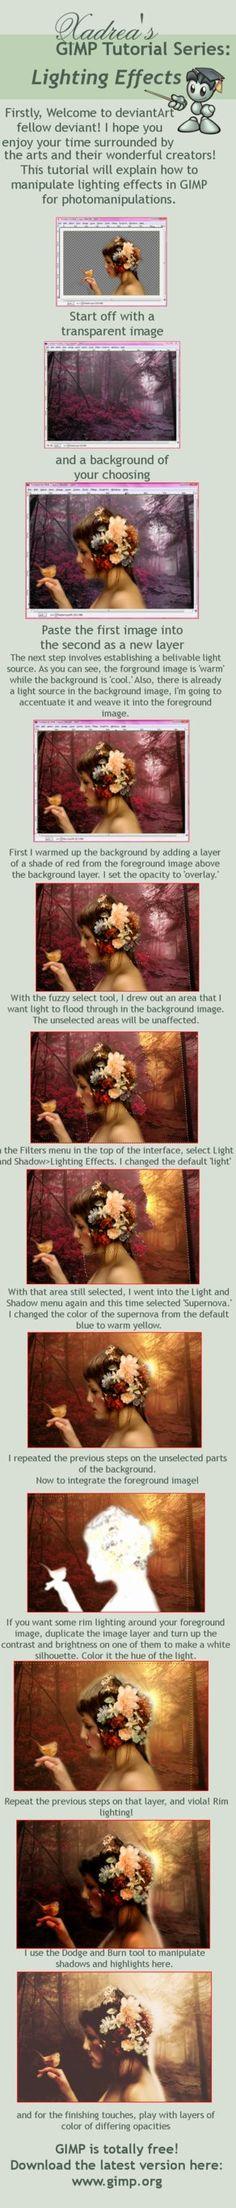 Gimp Tutorial: Lighting Effects by Xadrea on DeviantArt